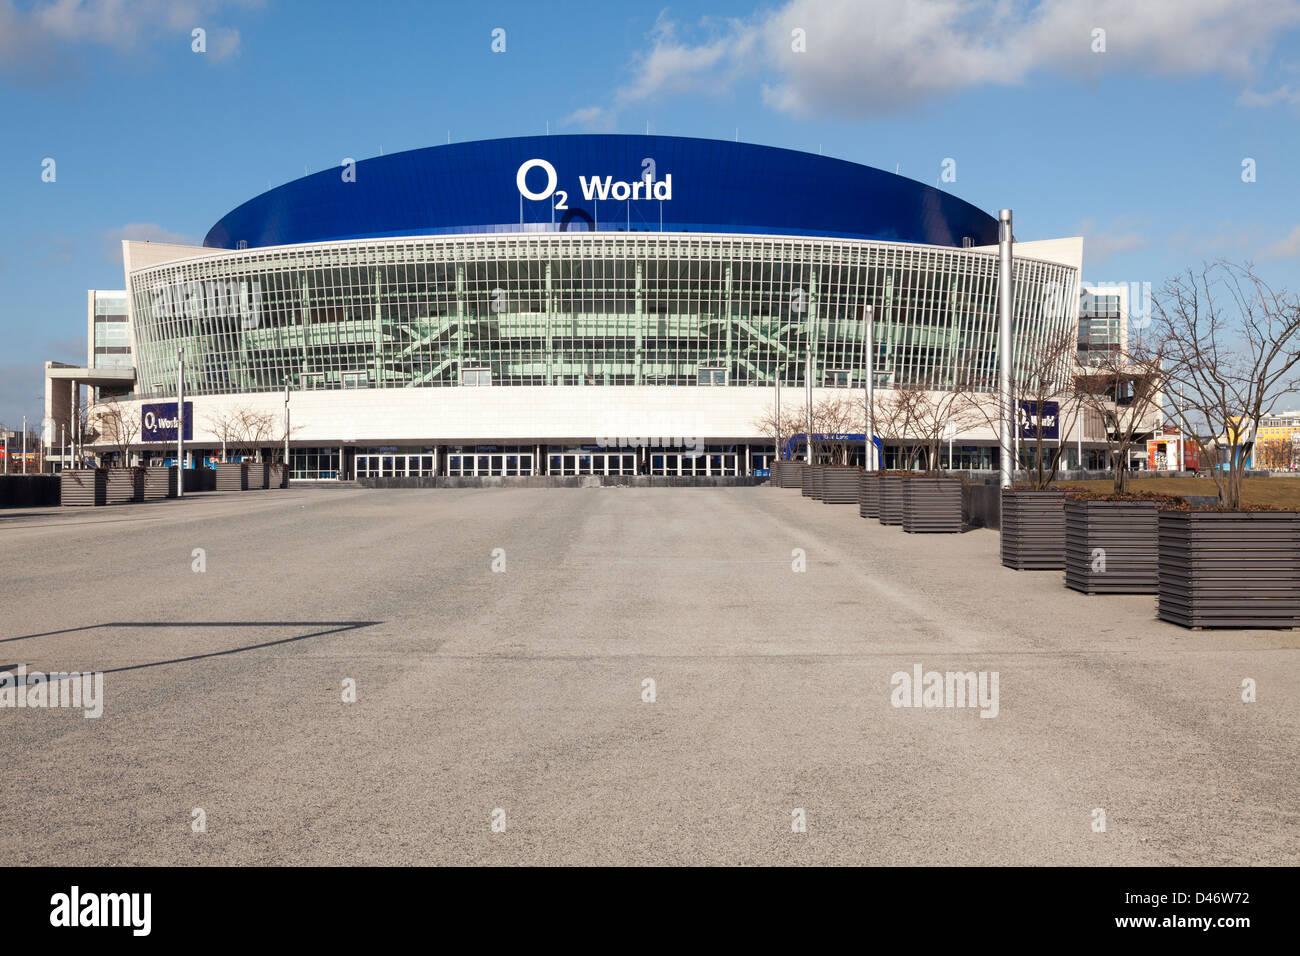 O2 World Arena, Berlin, Germany Stock Photo